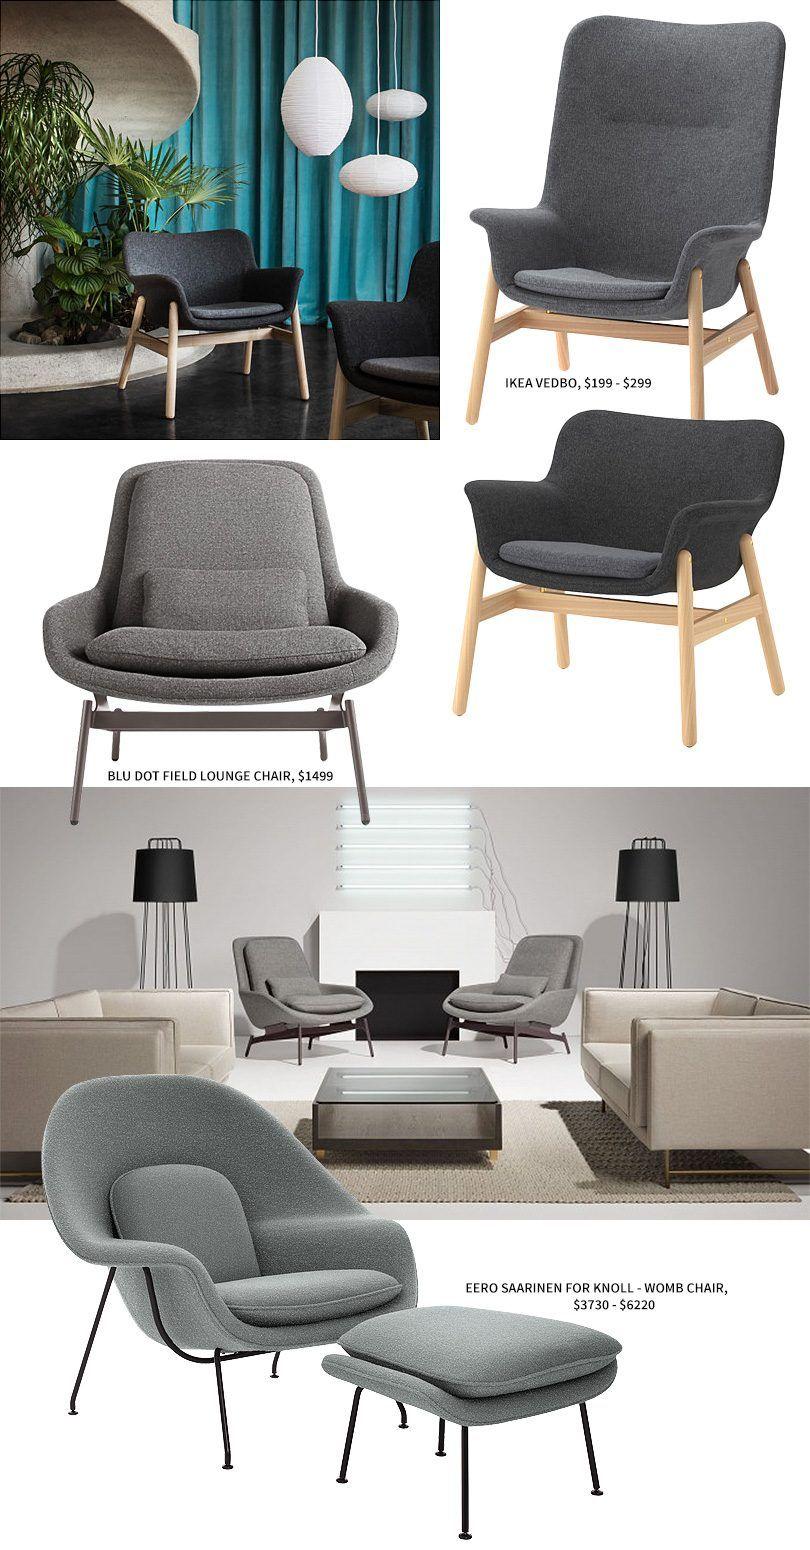 Ikea Vedbo Vs Blu Dot Field Lounge Chair Eero Saarinen Womb